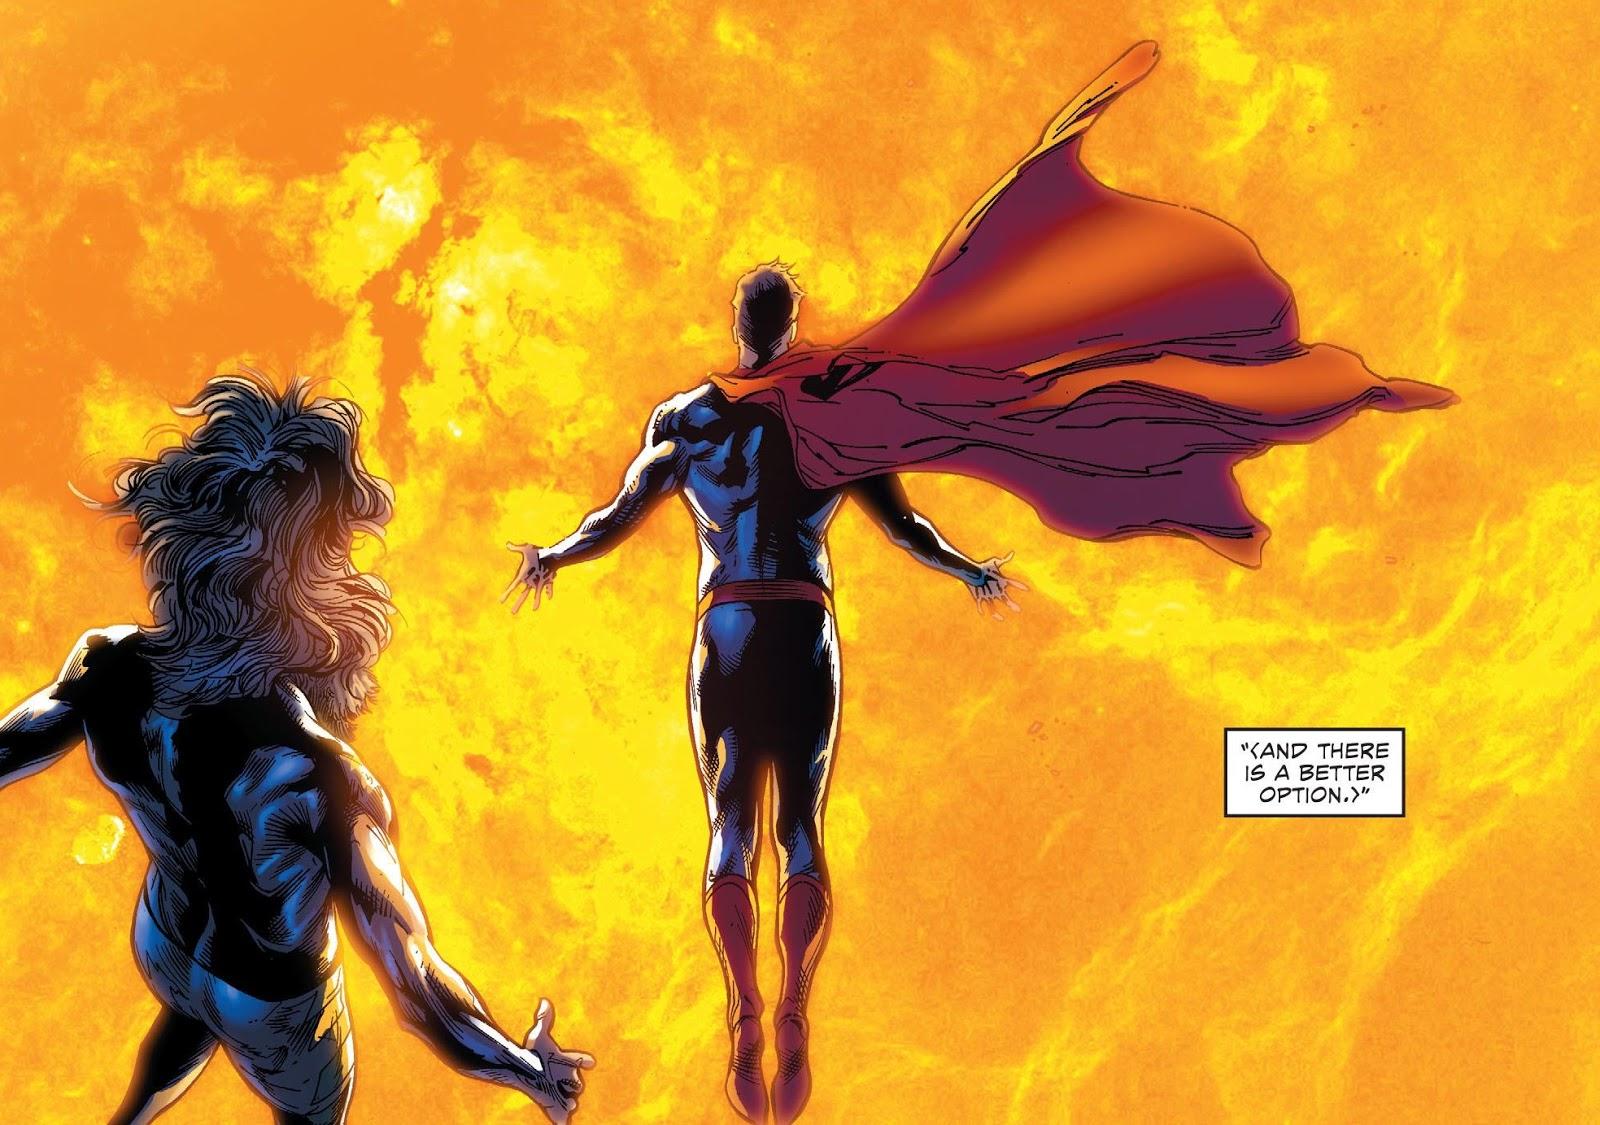 Superwoman vs batman the movie armenian model vs dominican man snapchat missnorthwestx - 1 8